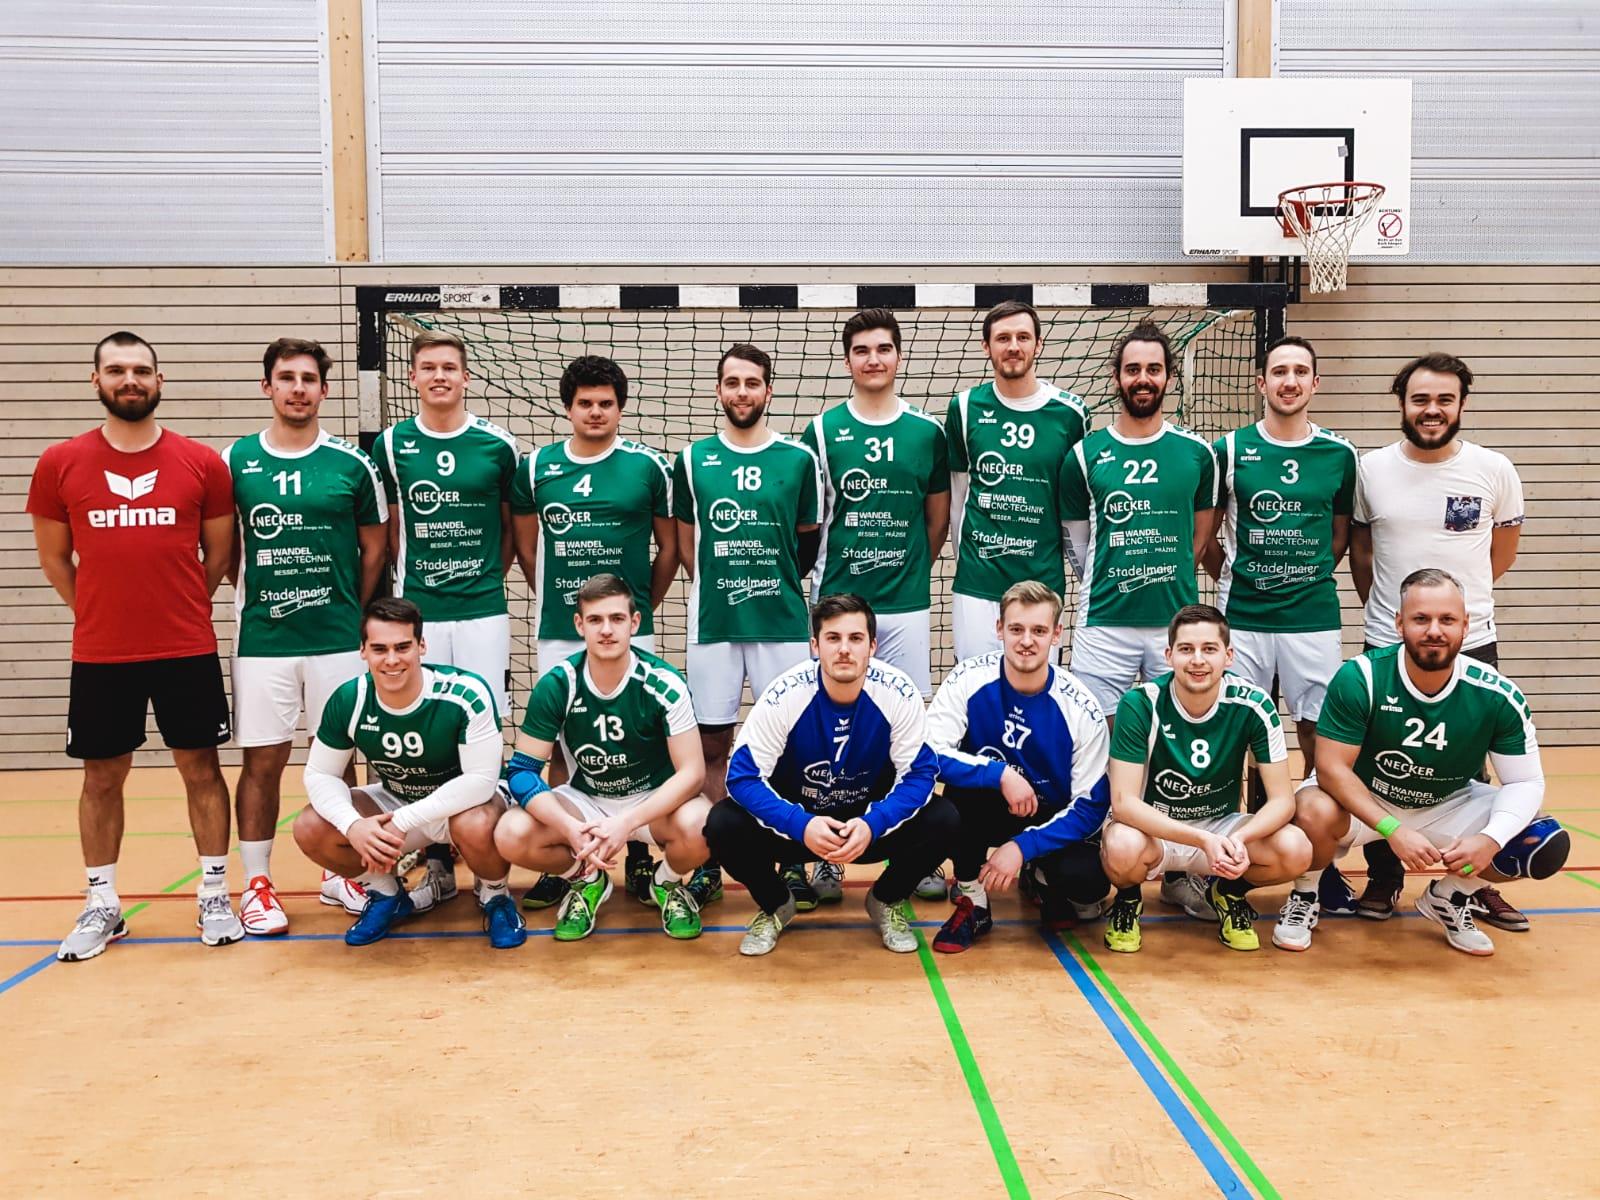 Erste Mannschaft CVJM Walddorfhäslach